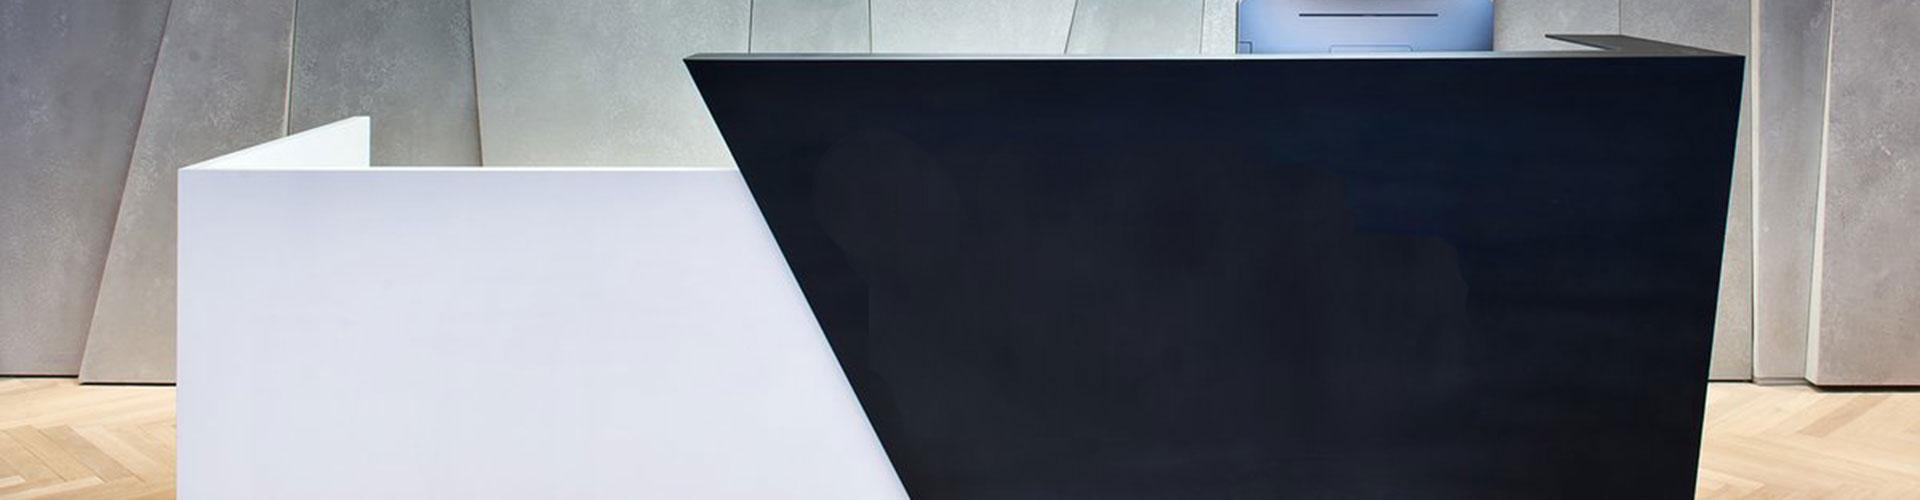 concrete-counter-1-By-BETONADA